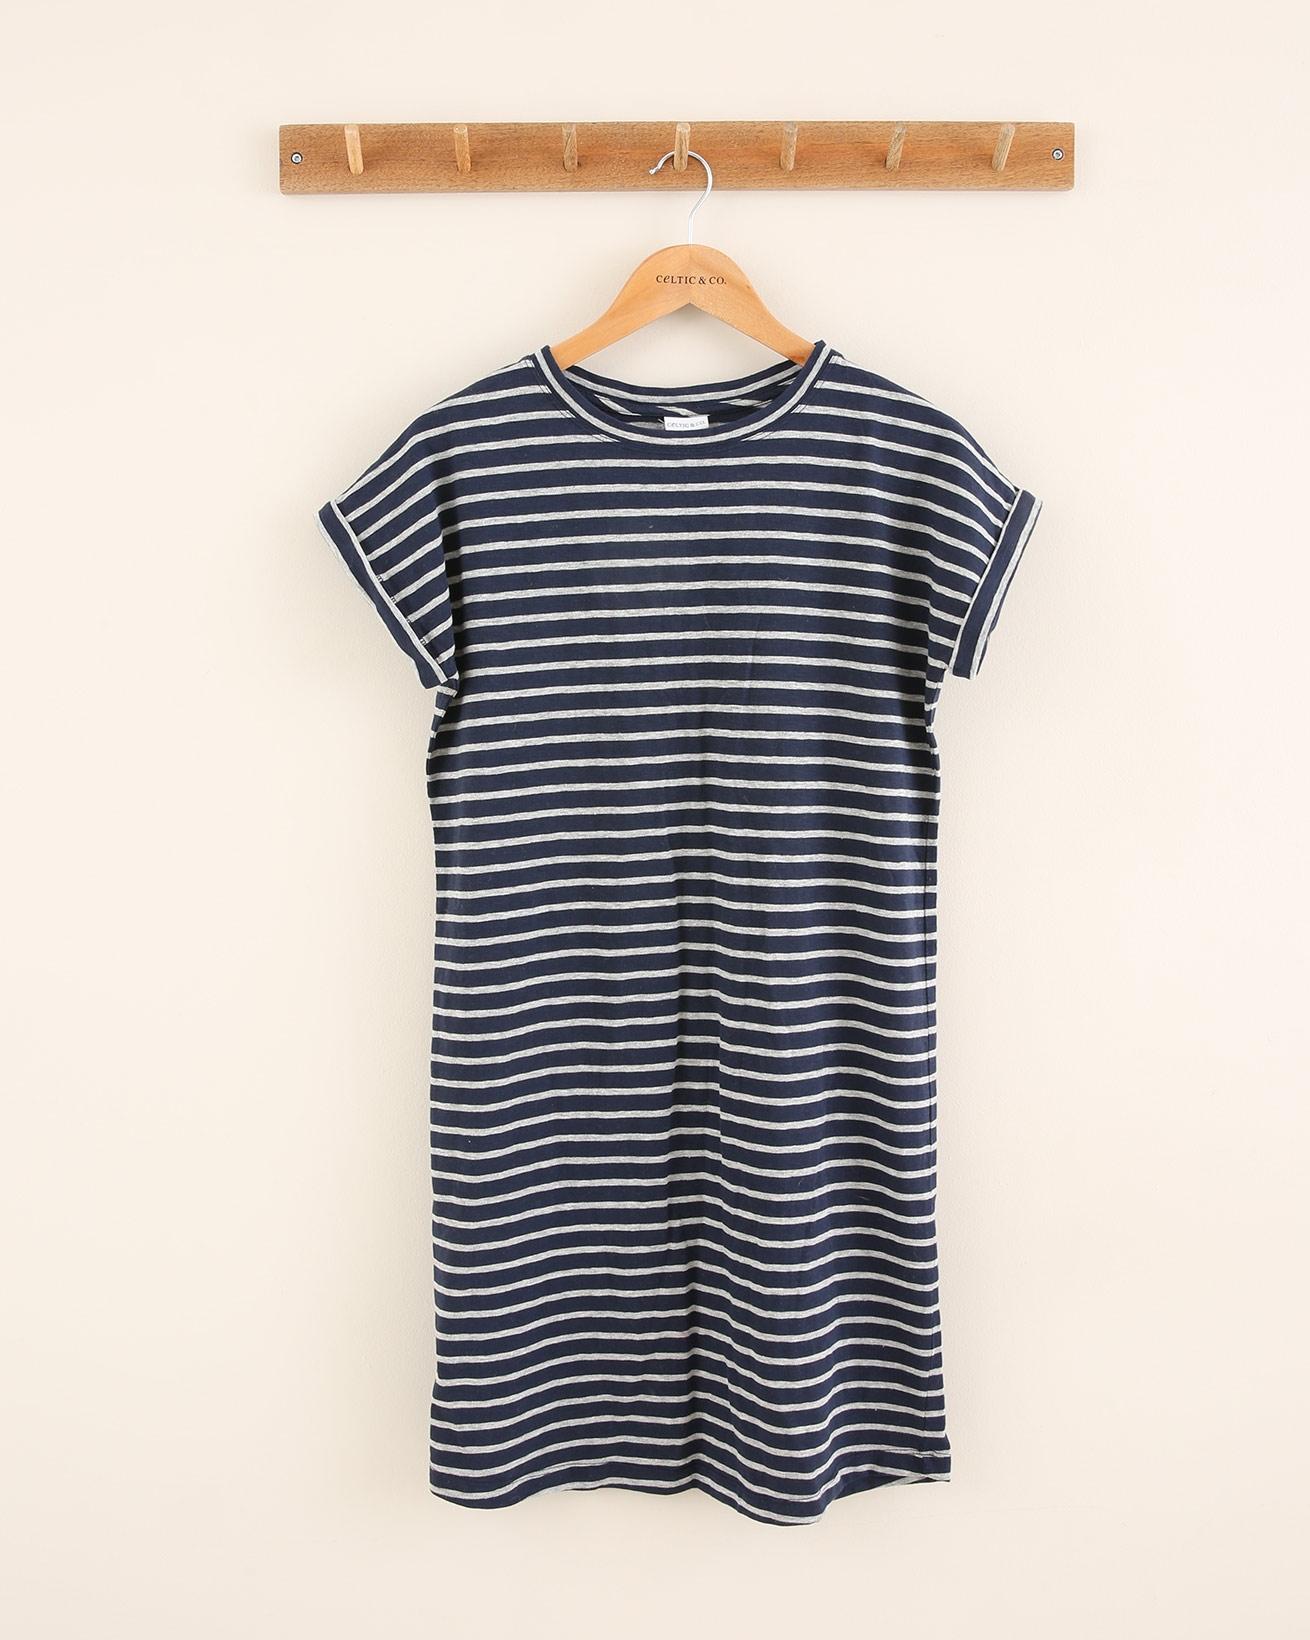 Cotton Tshirt Dress - Size Small - Navy Grey Stripe - 1791